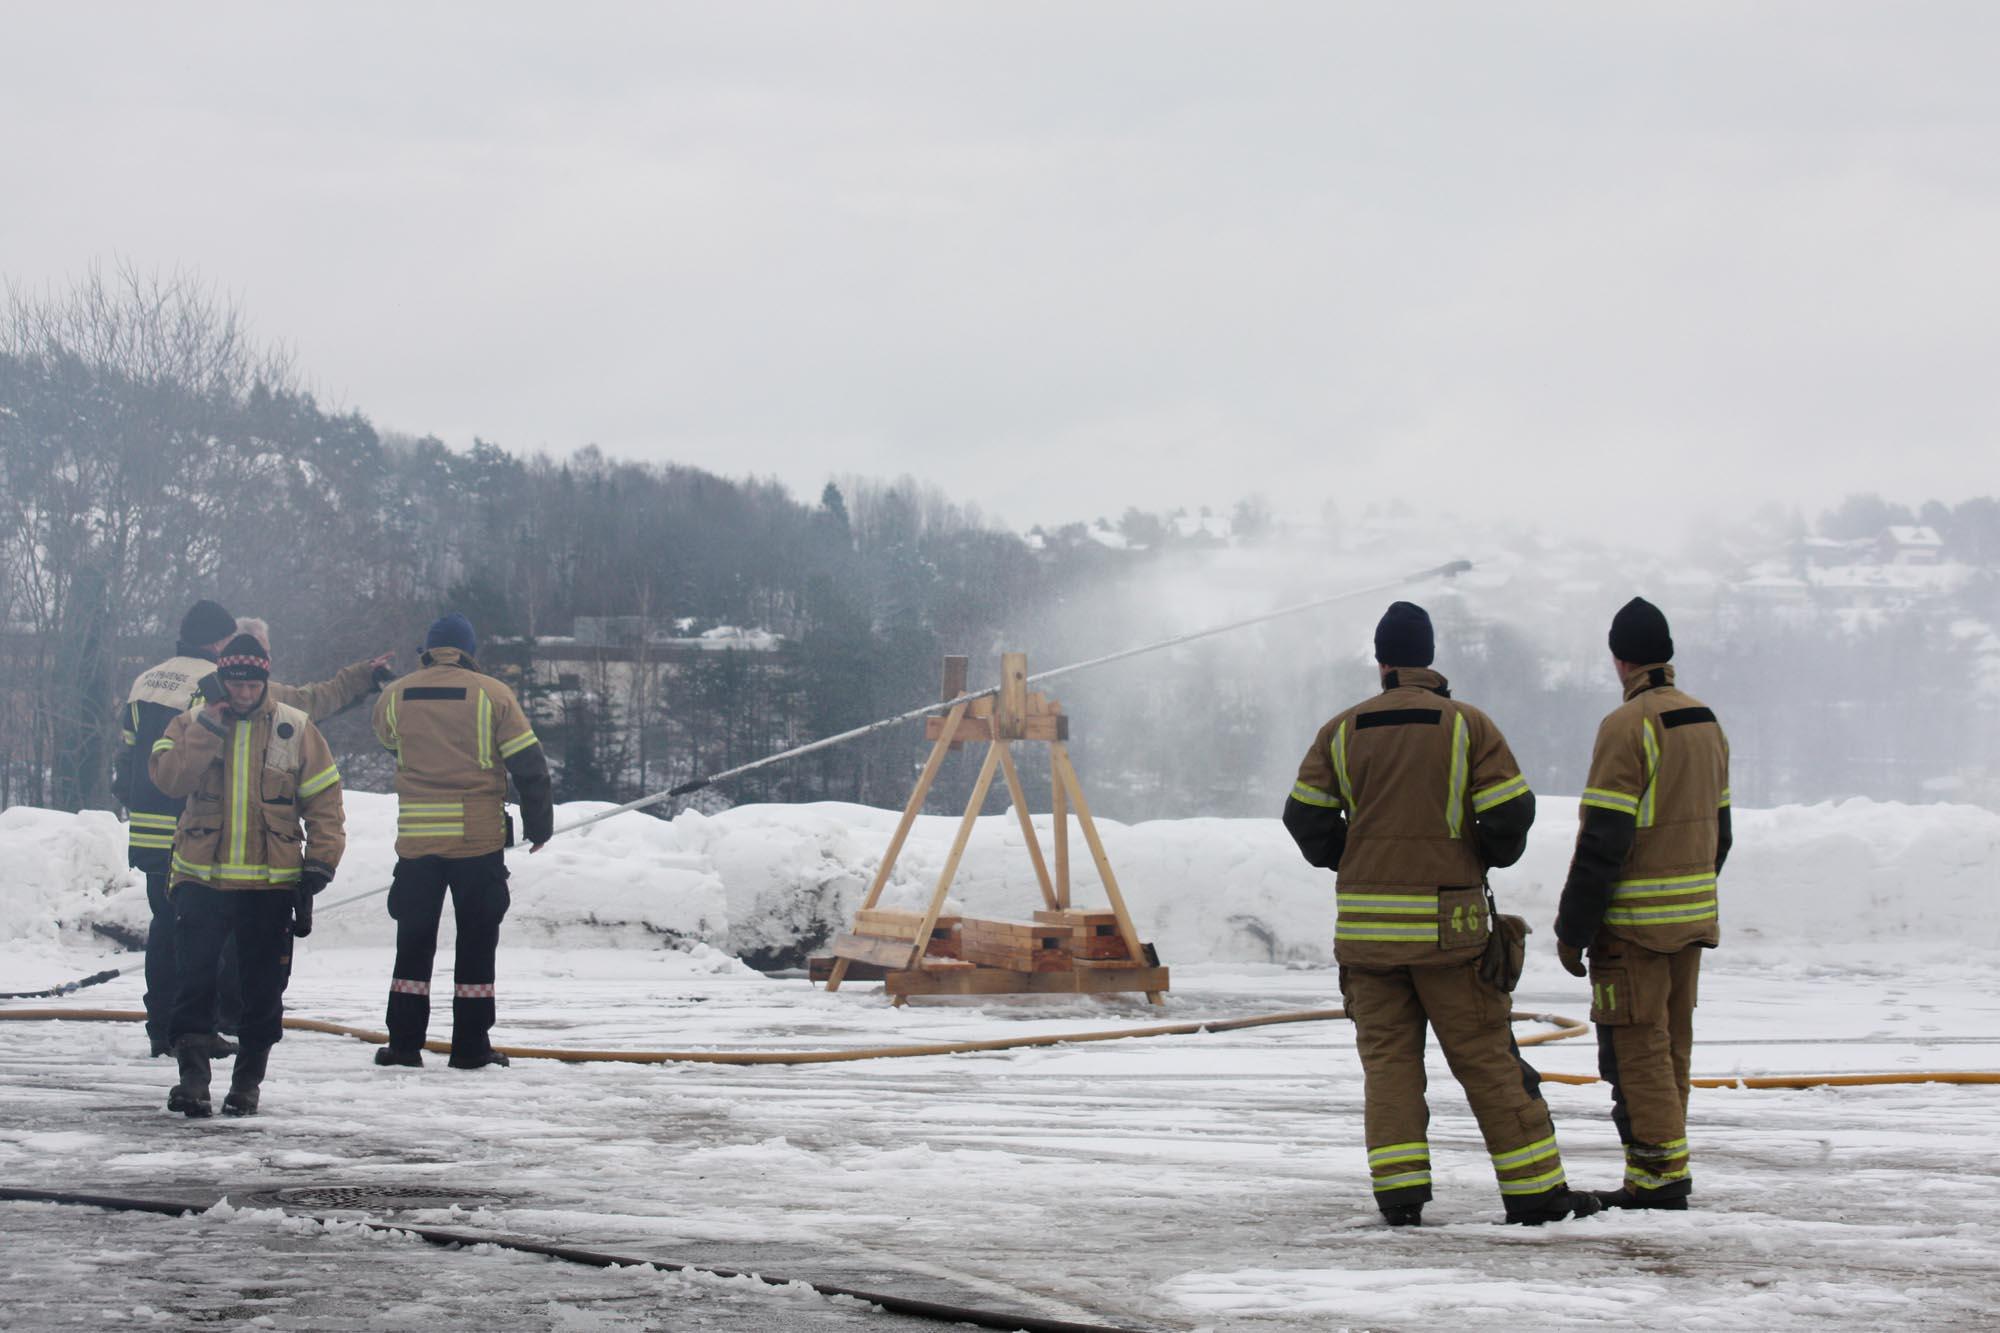 Firelance firefighting device